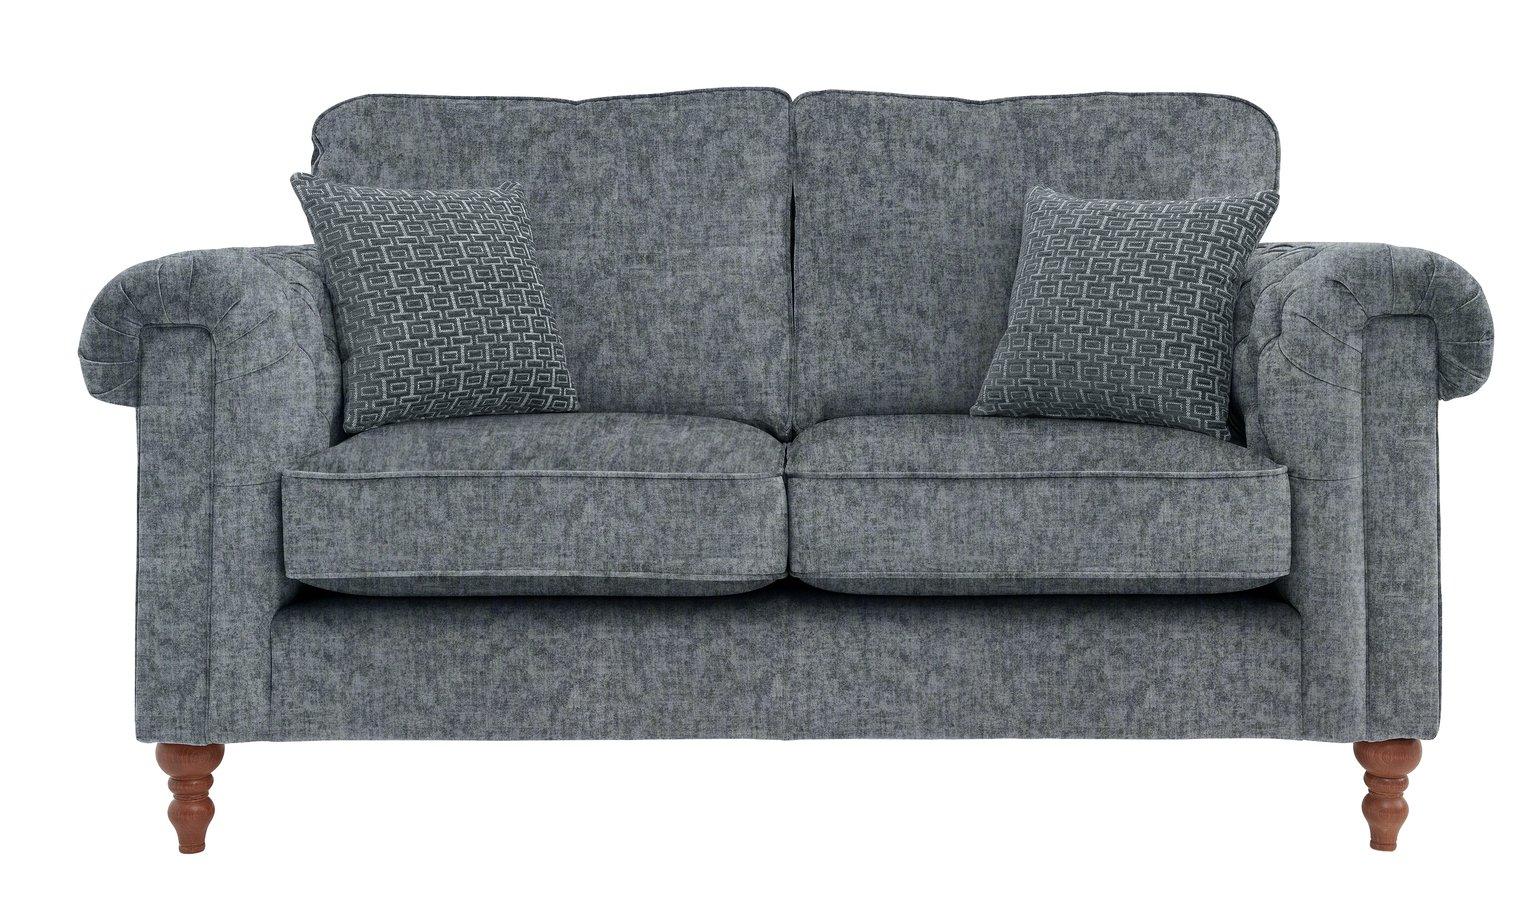 Argos Home Rebecca 2 Seater Fabric Sofa - Charcoal